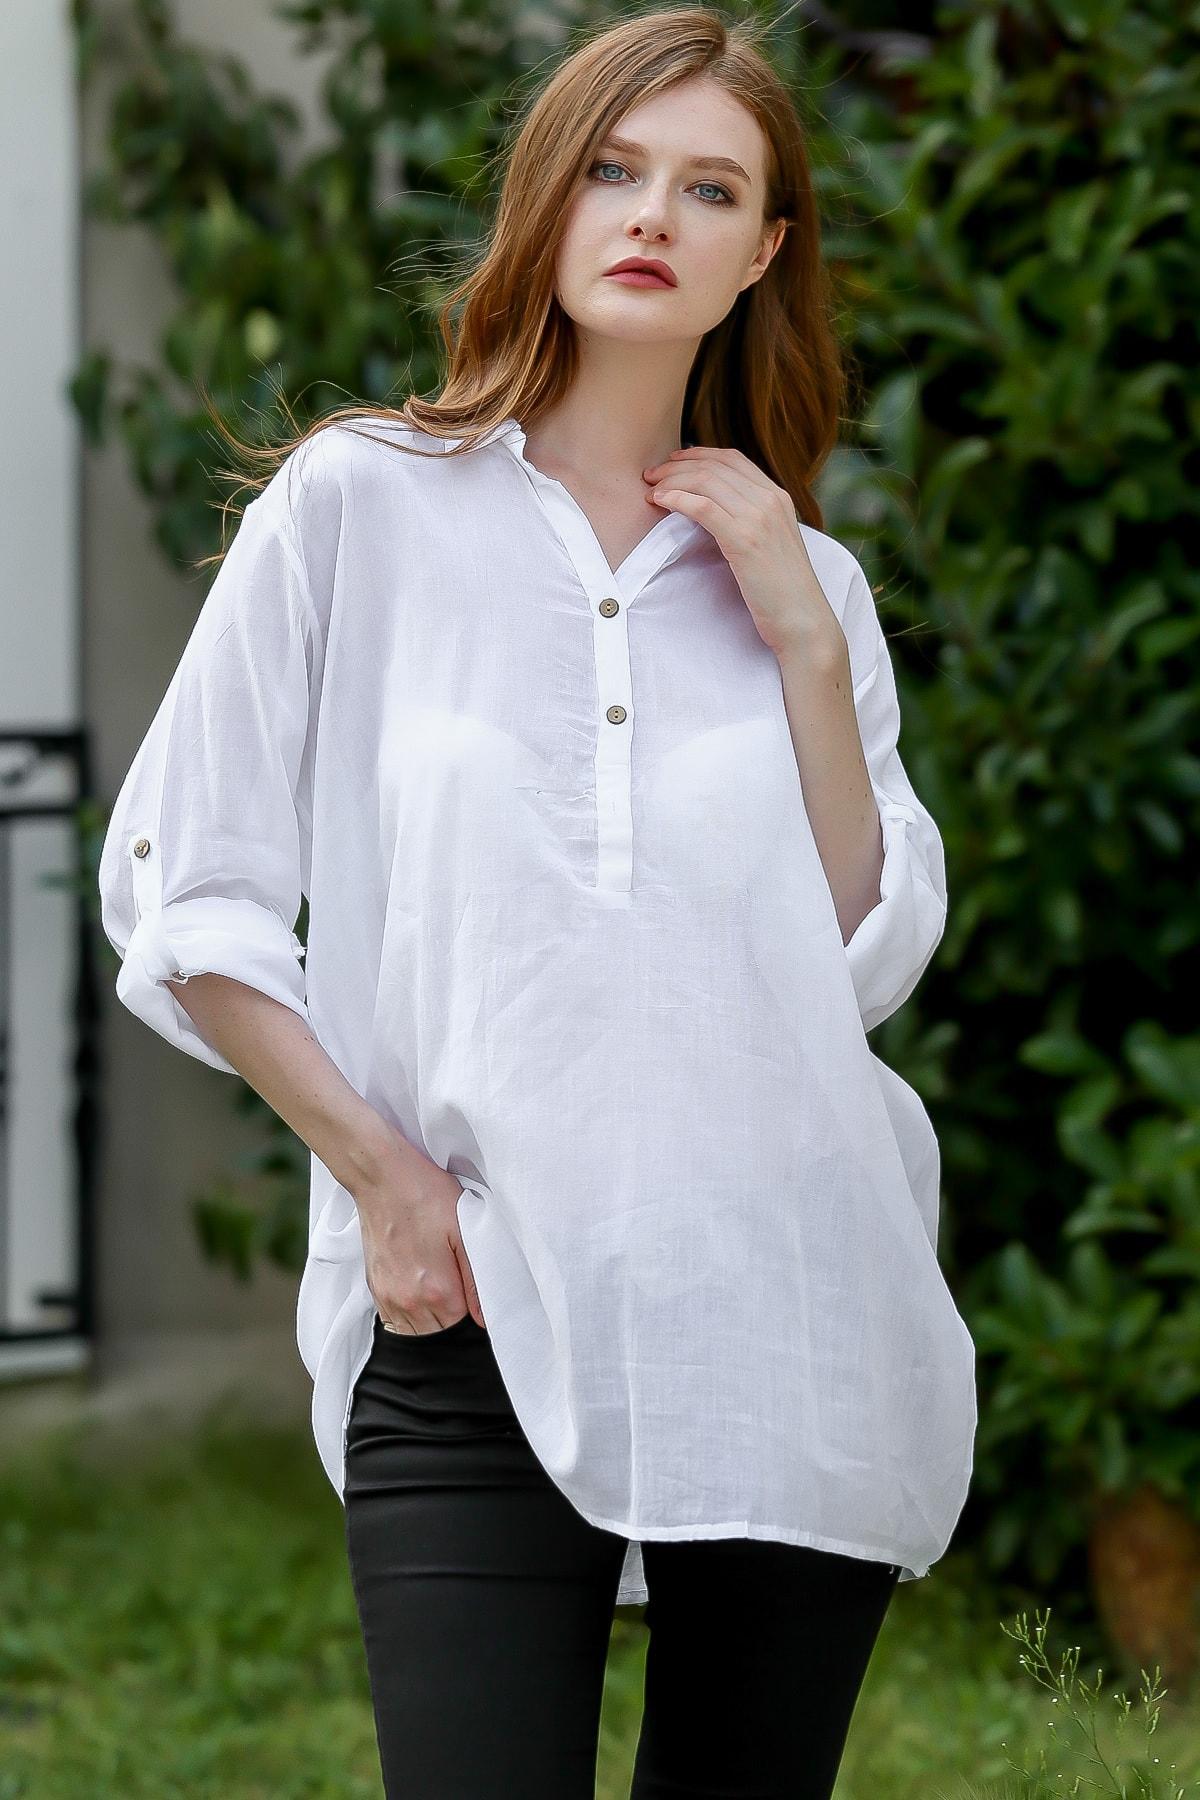 Chiccy Kadın Beyaz Bohem salaş ayarlı kol detaylı patı düğmeli gömlek M10010400GM99511